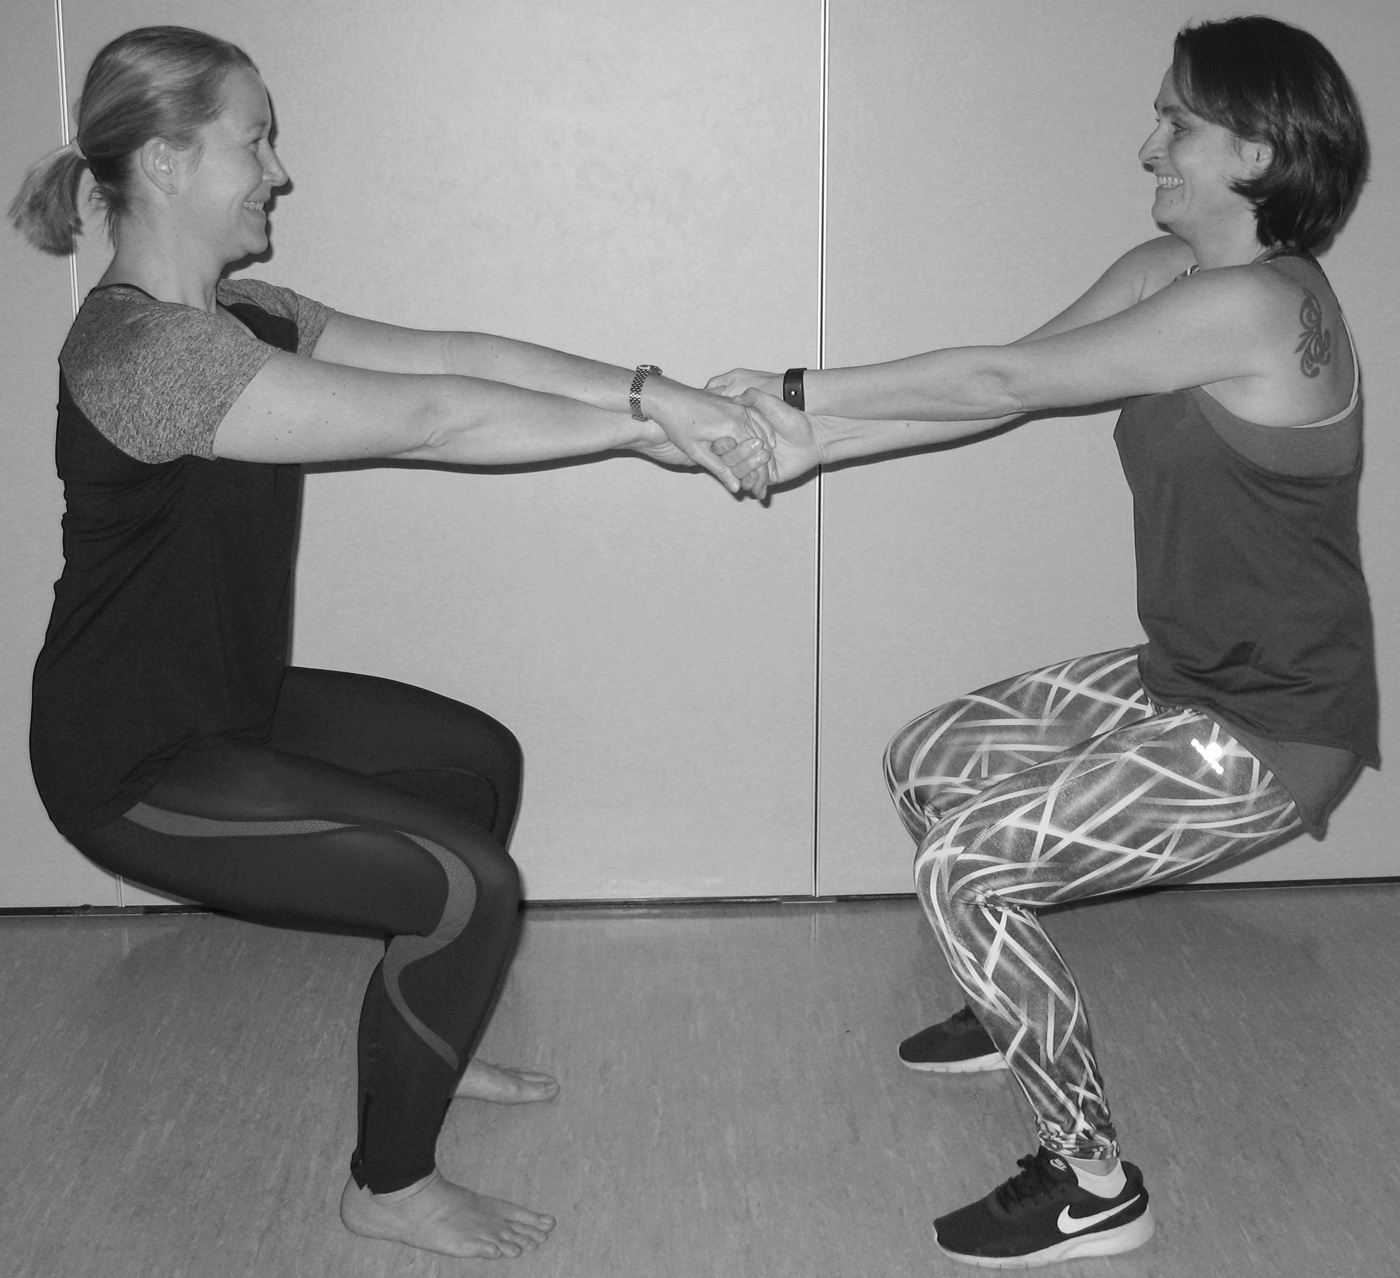 Zusammen fit –Das Fit Mamas Partner Workout | comuvo Blog